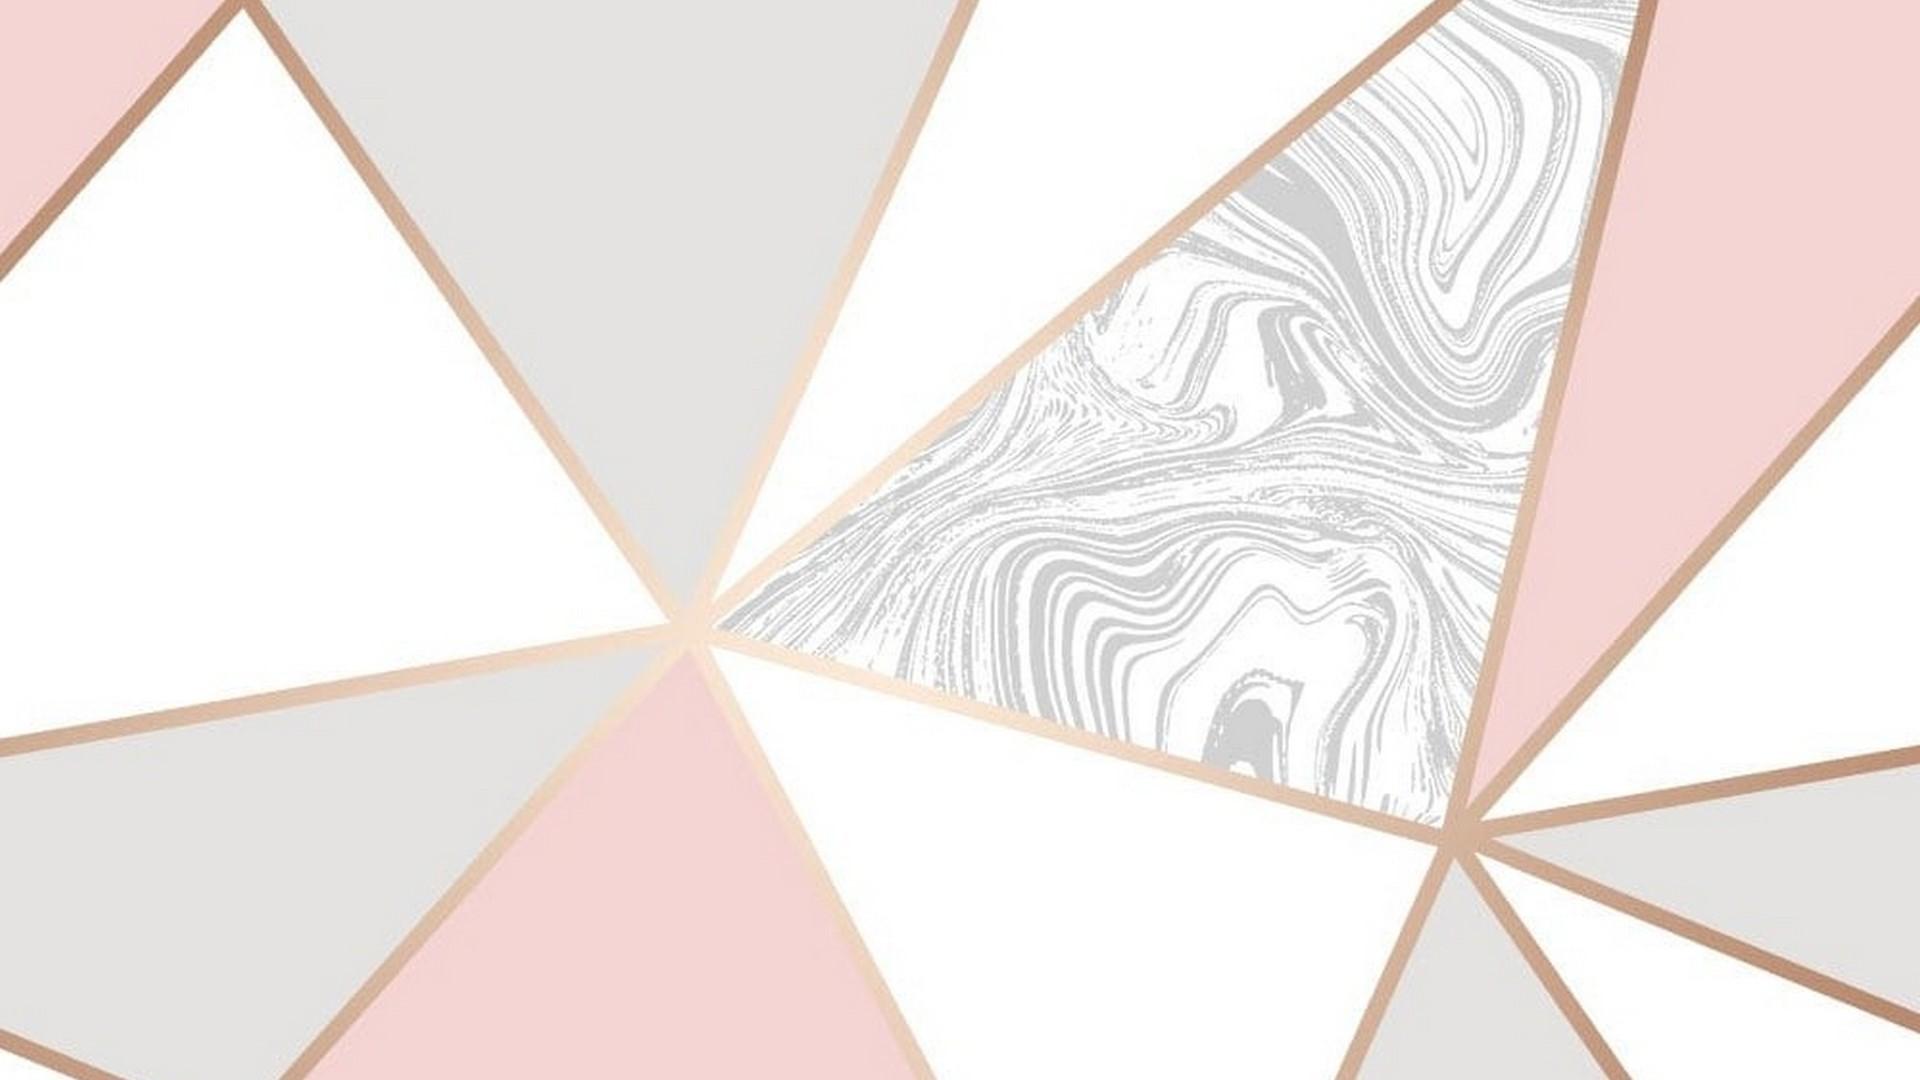 1920x1080, Wallpaper Rose Gold Marble   Data Id 15772 - Dingle Peninsula - HD Wallpaper